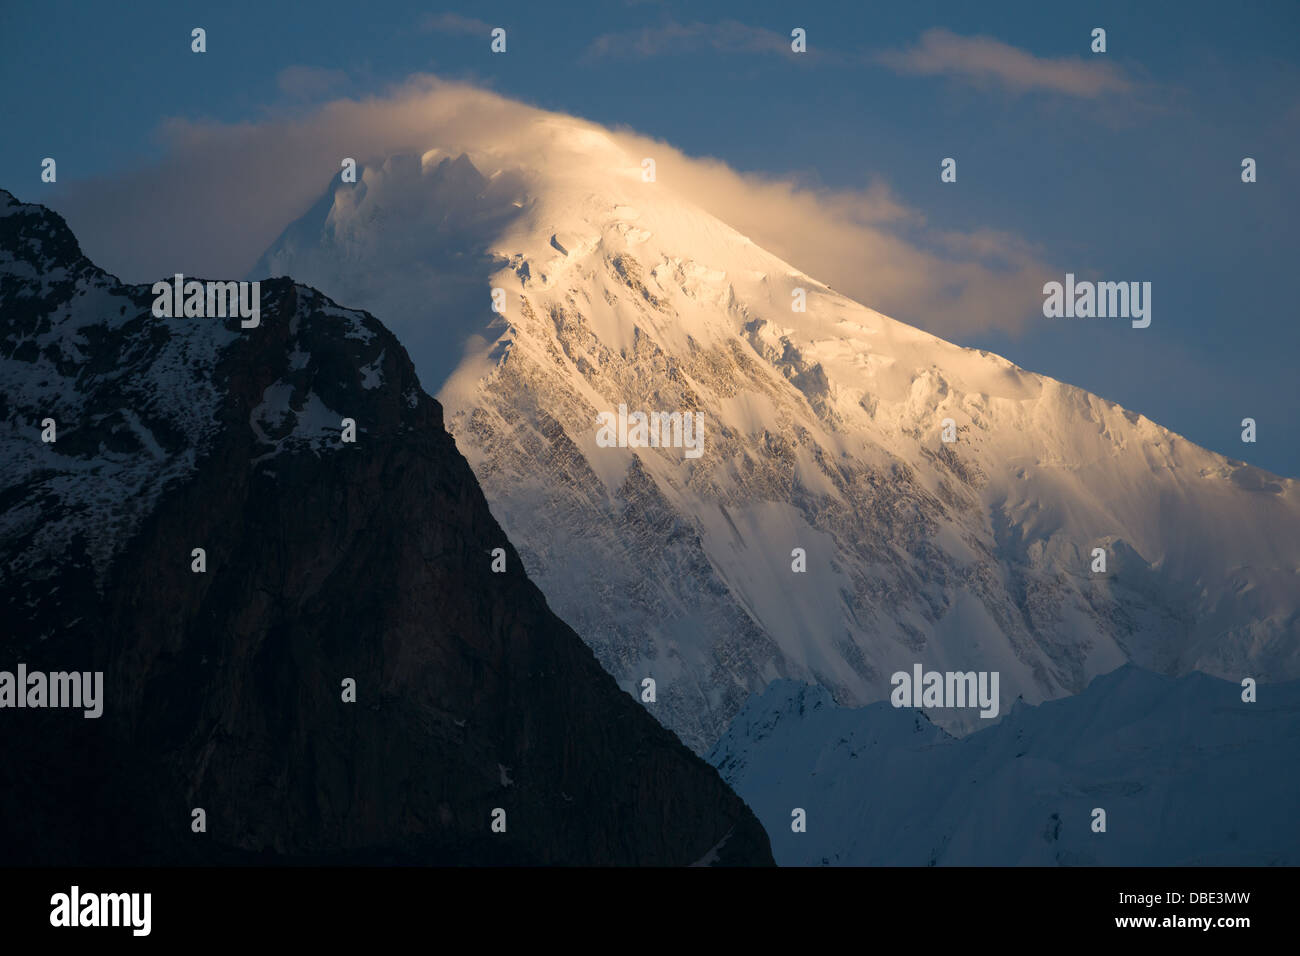 Diran Peak seen from Karimabad at sunset, Hunza Valley, Gilgit-Baltistan, Pakistan - Stock Image